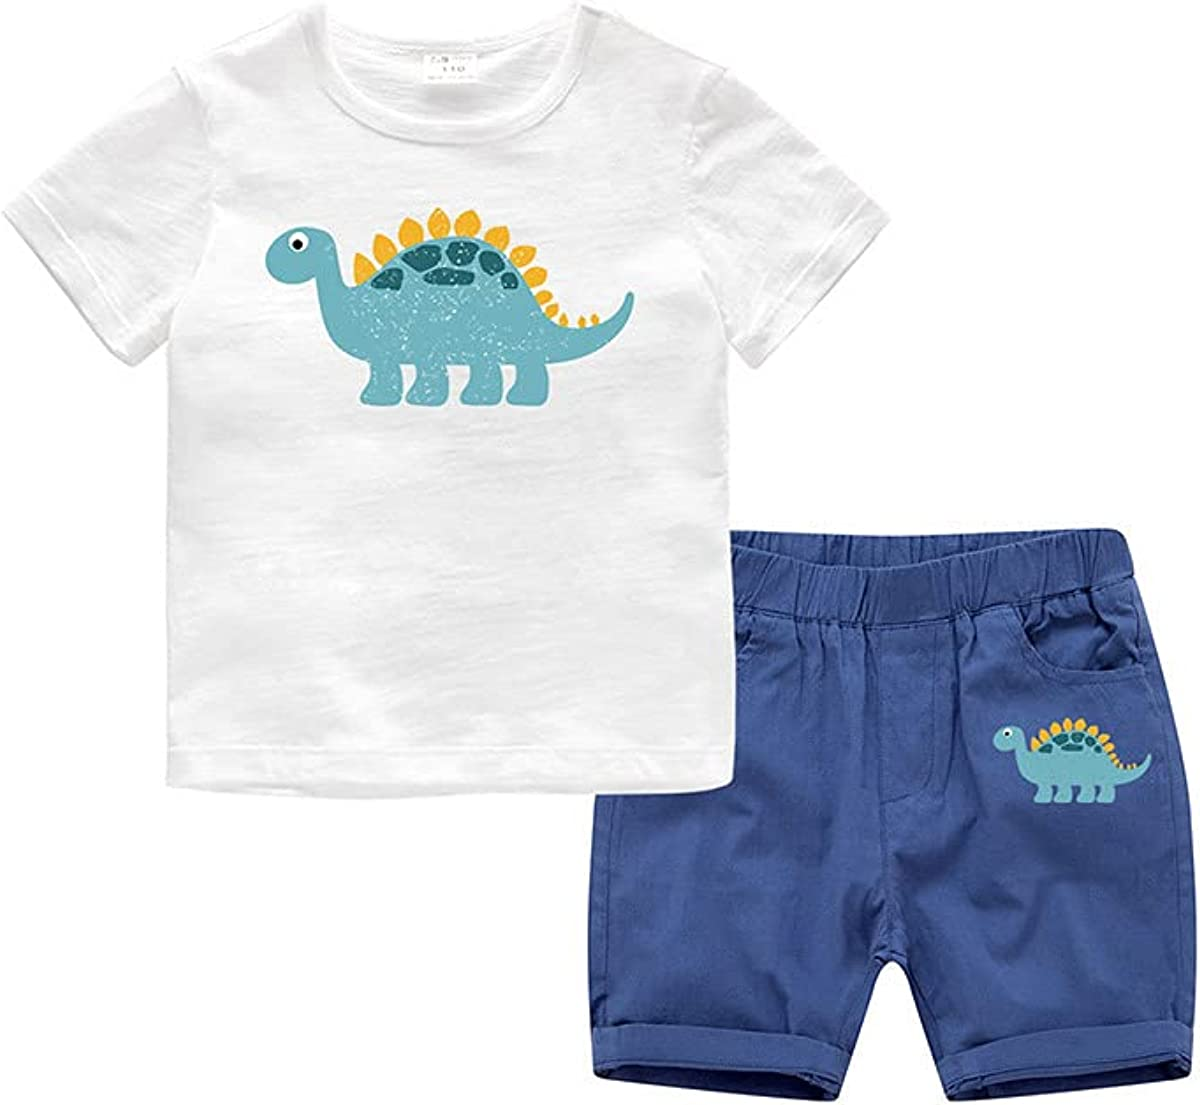 Rabuet Boys' Summer Cute Diansour Pattern Cotton Short Outfits Set